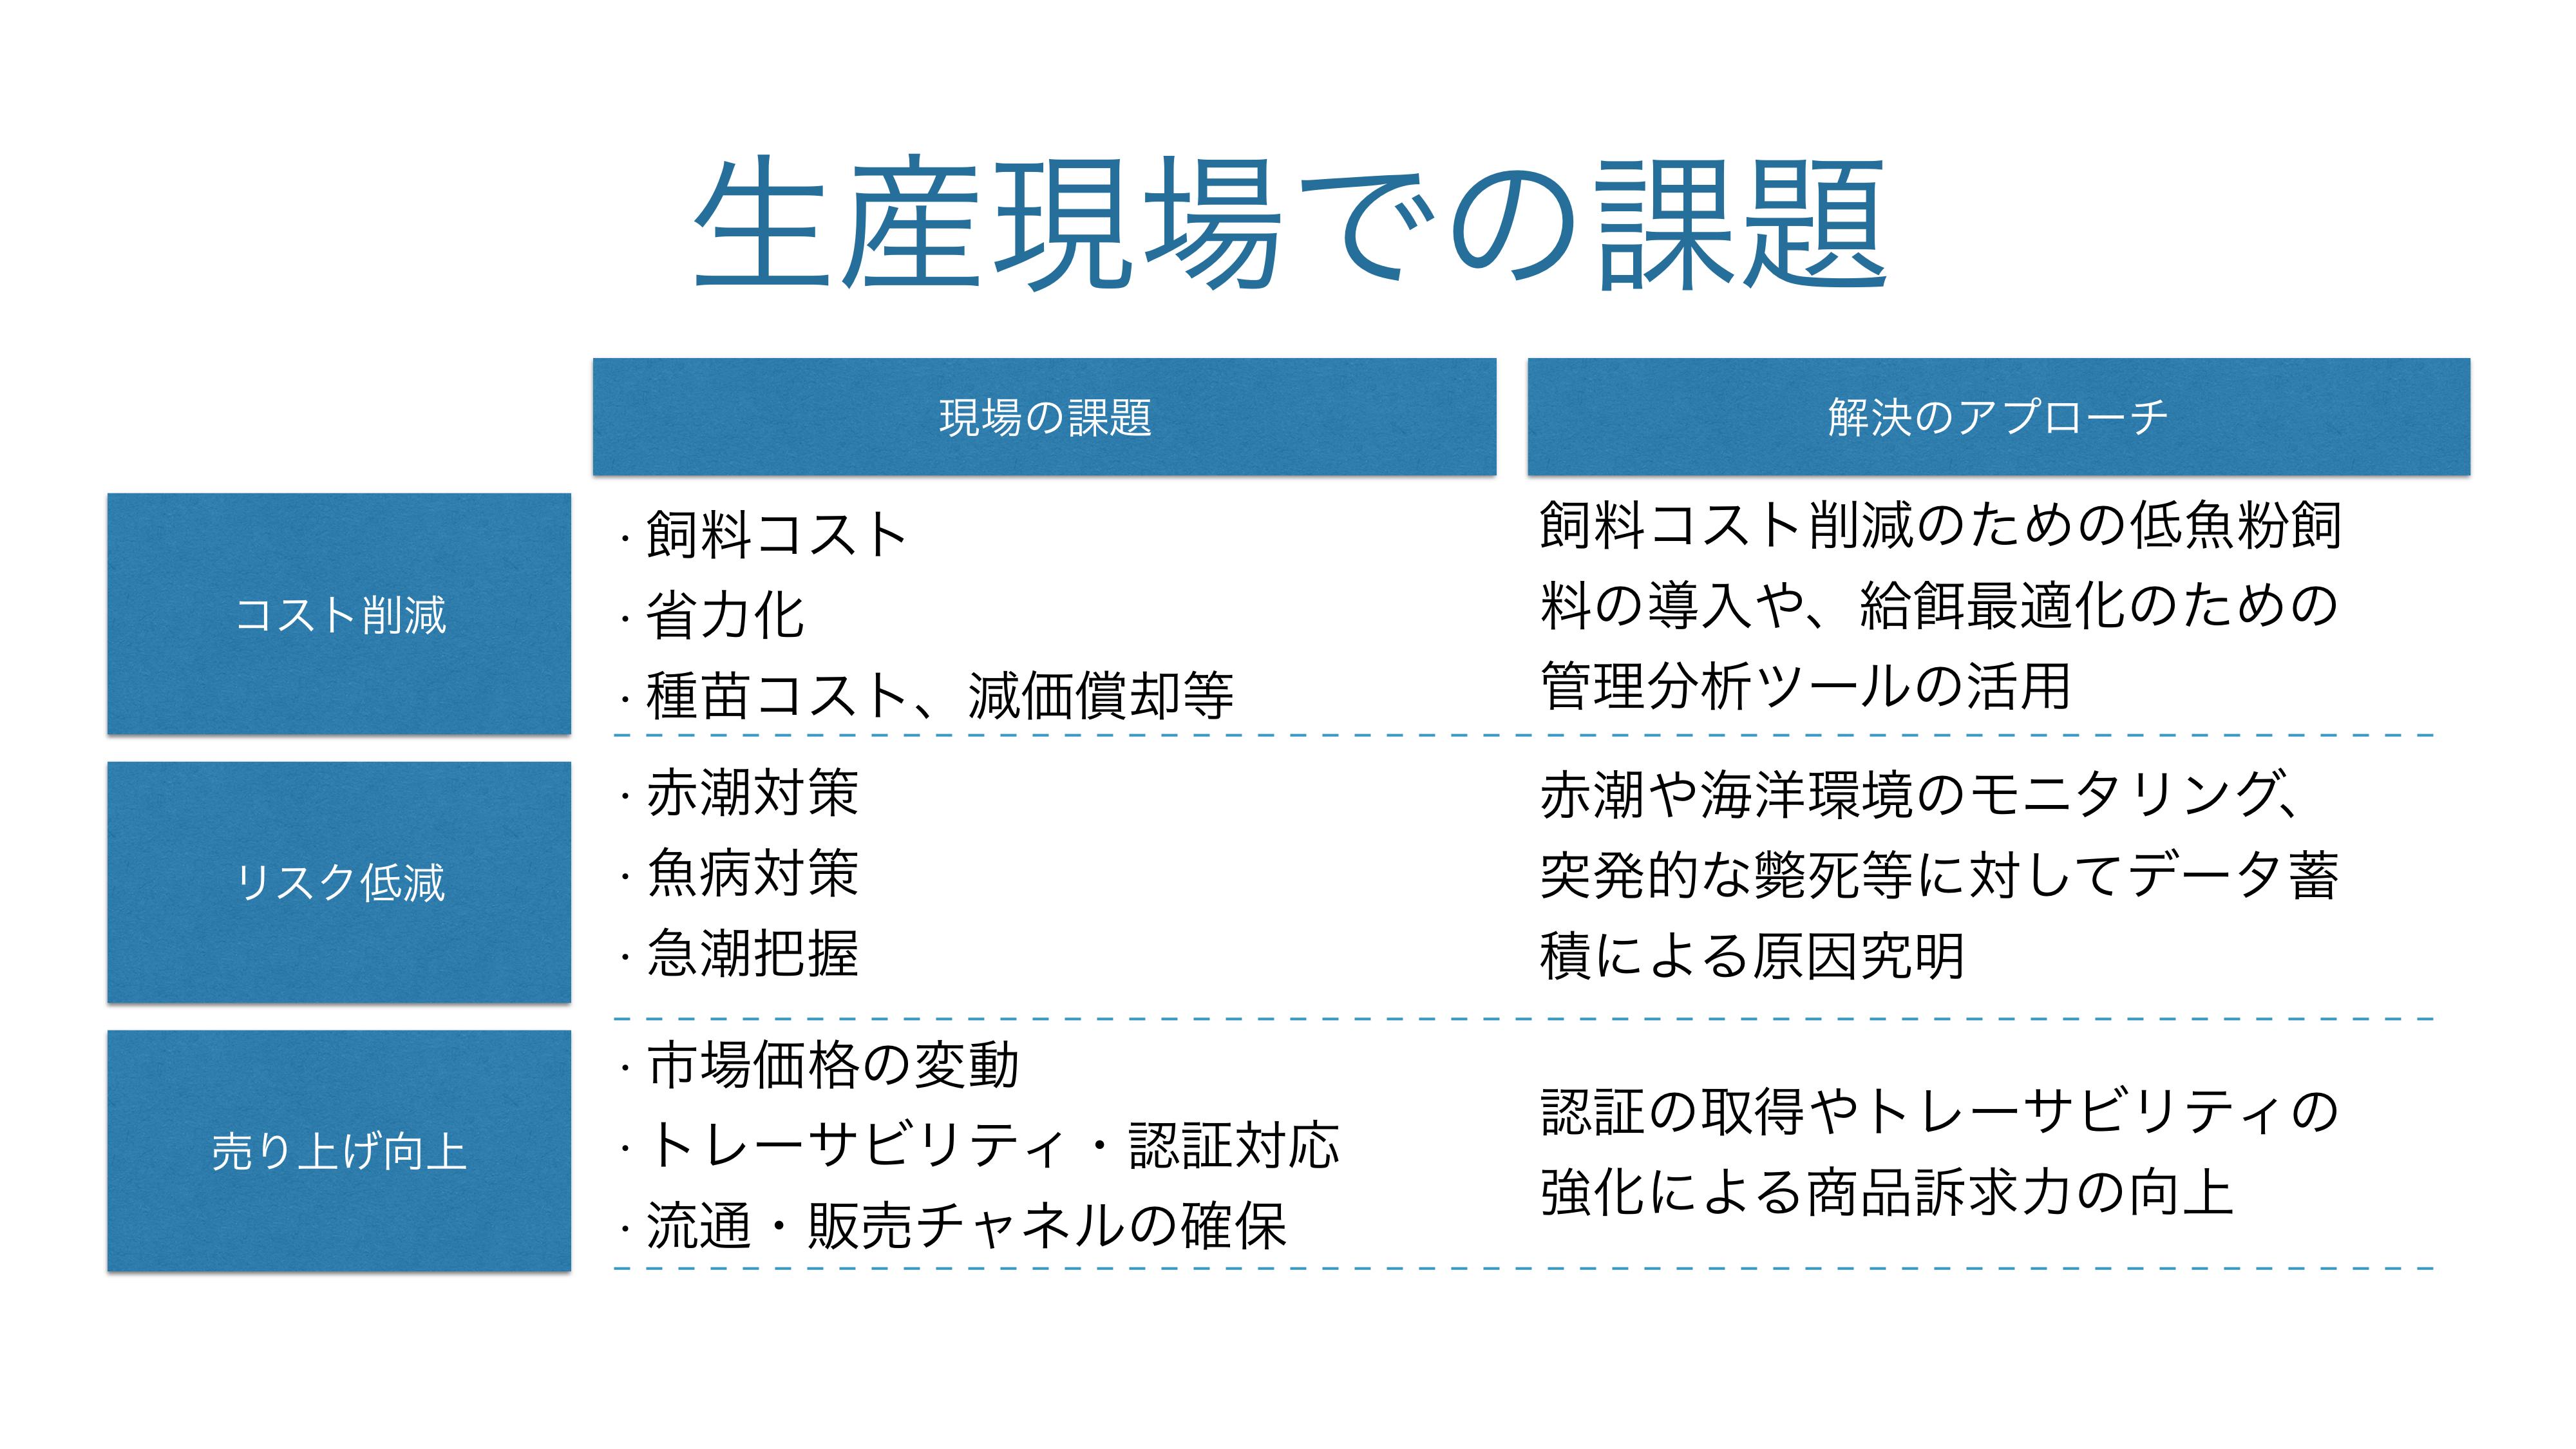 f:id:Imamura:20181220152525p:plain